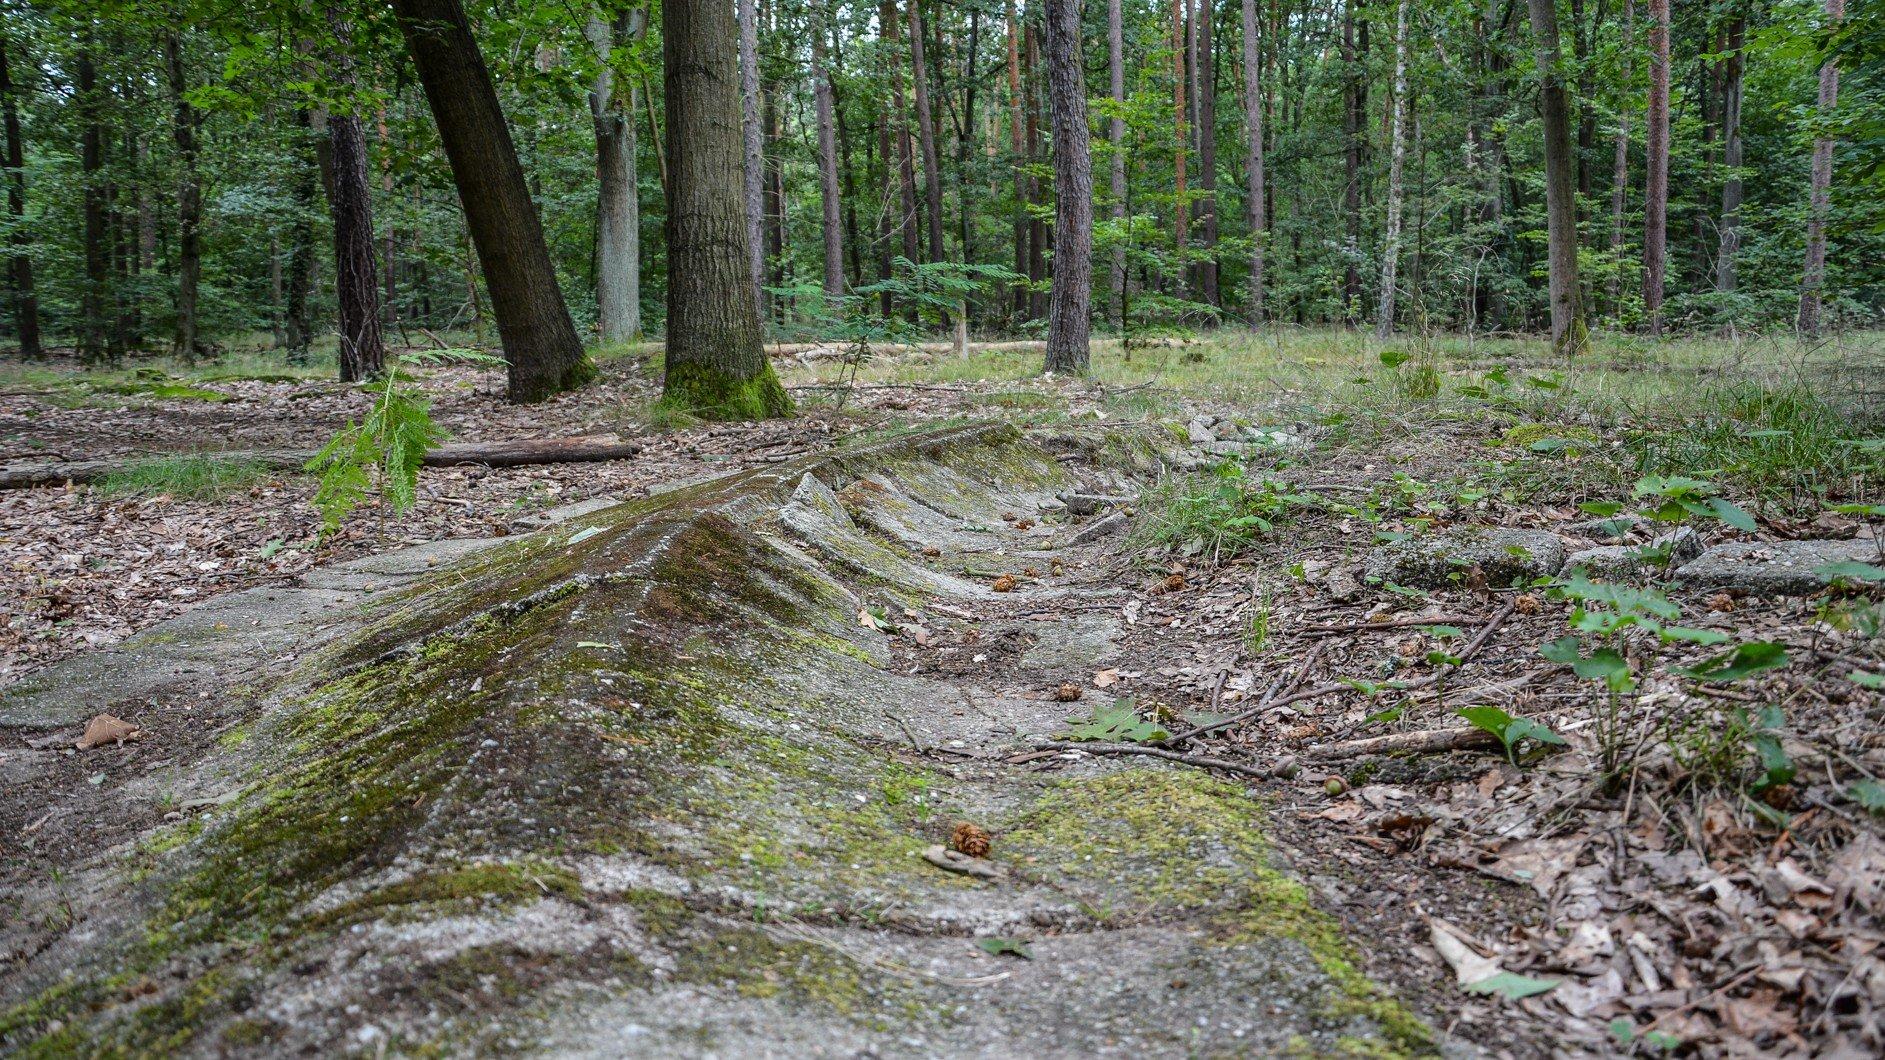 rechtskurve avus südkurve modell berlin charlottenburg lost places urbex abandoned berlin